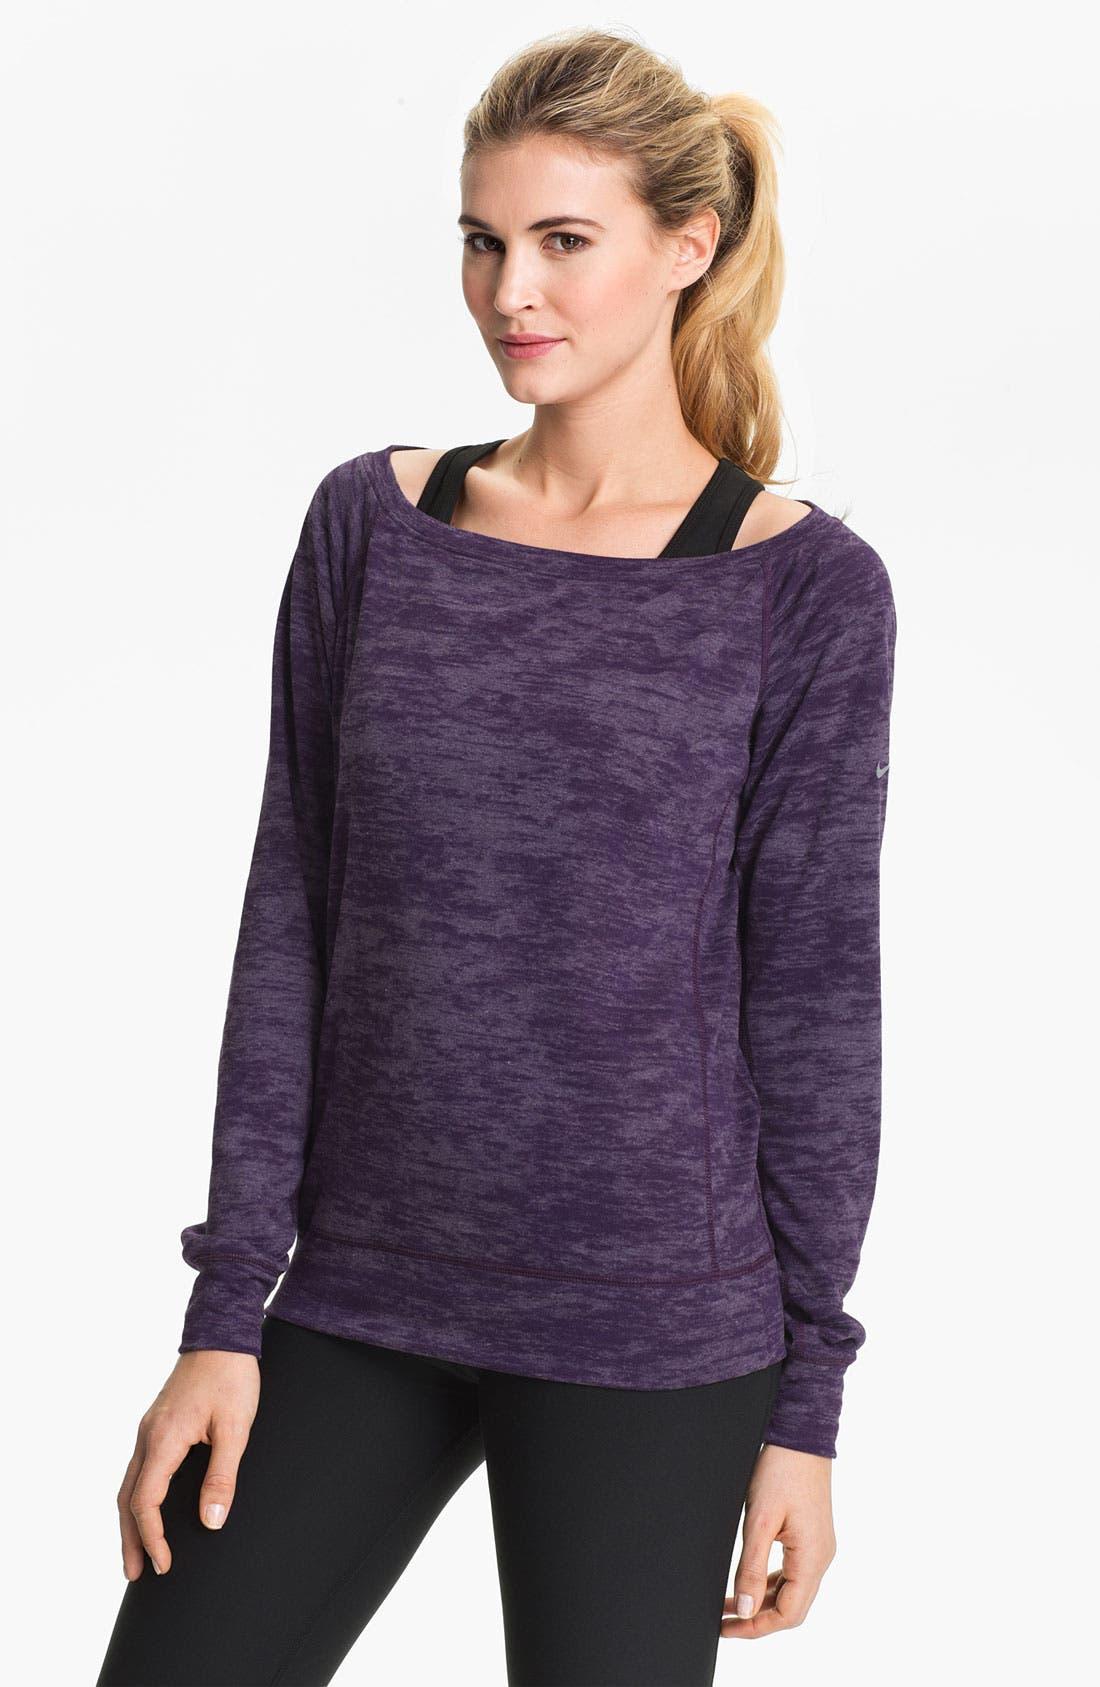 Main Image - Nike 'Critical Epic' Sweatshirt